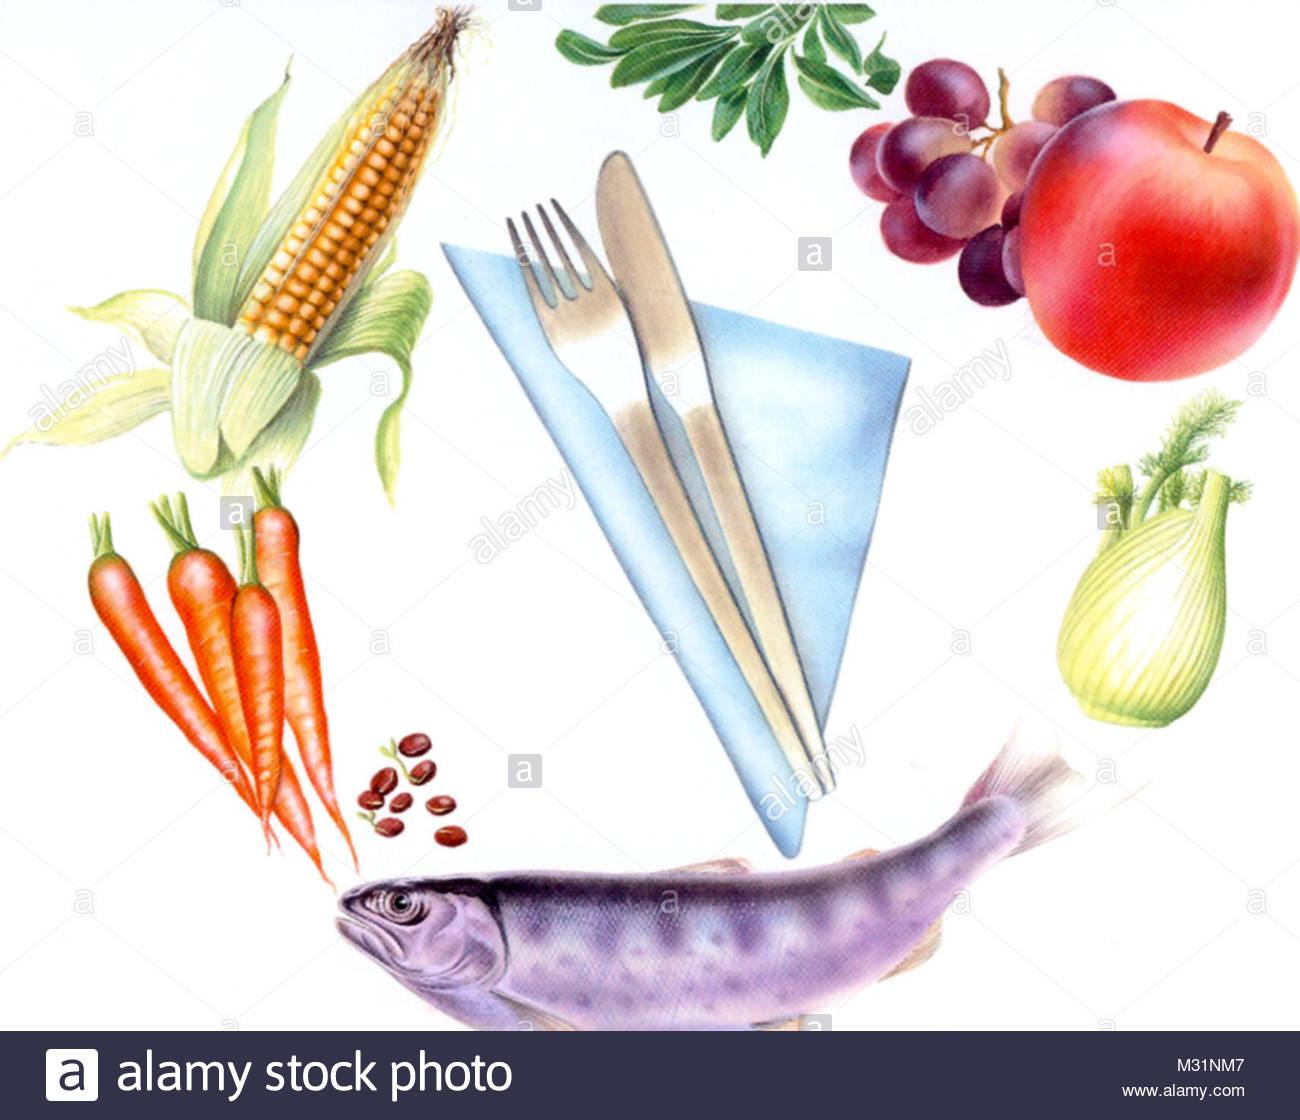 Healthy ernhren - Stock Image